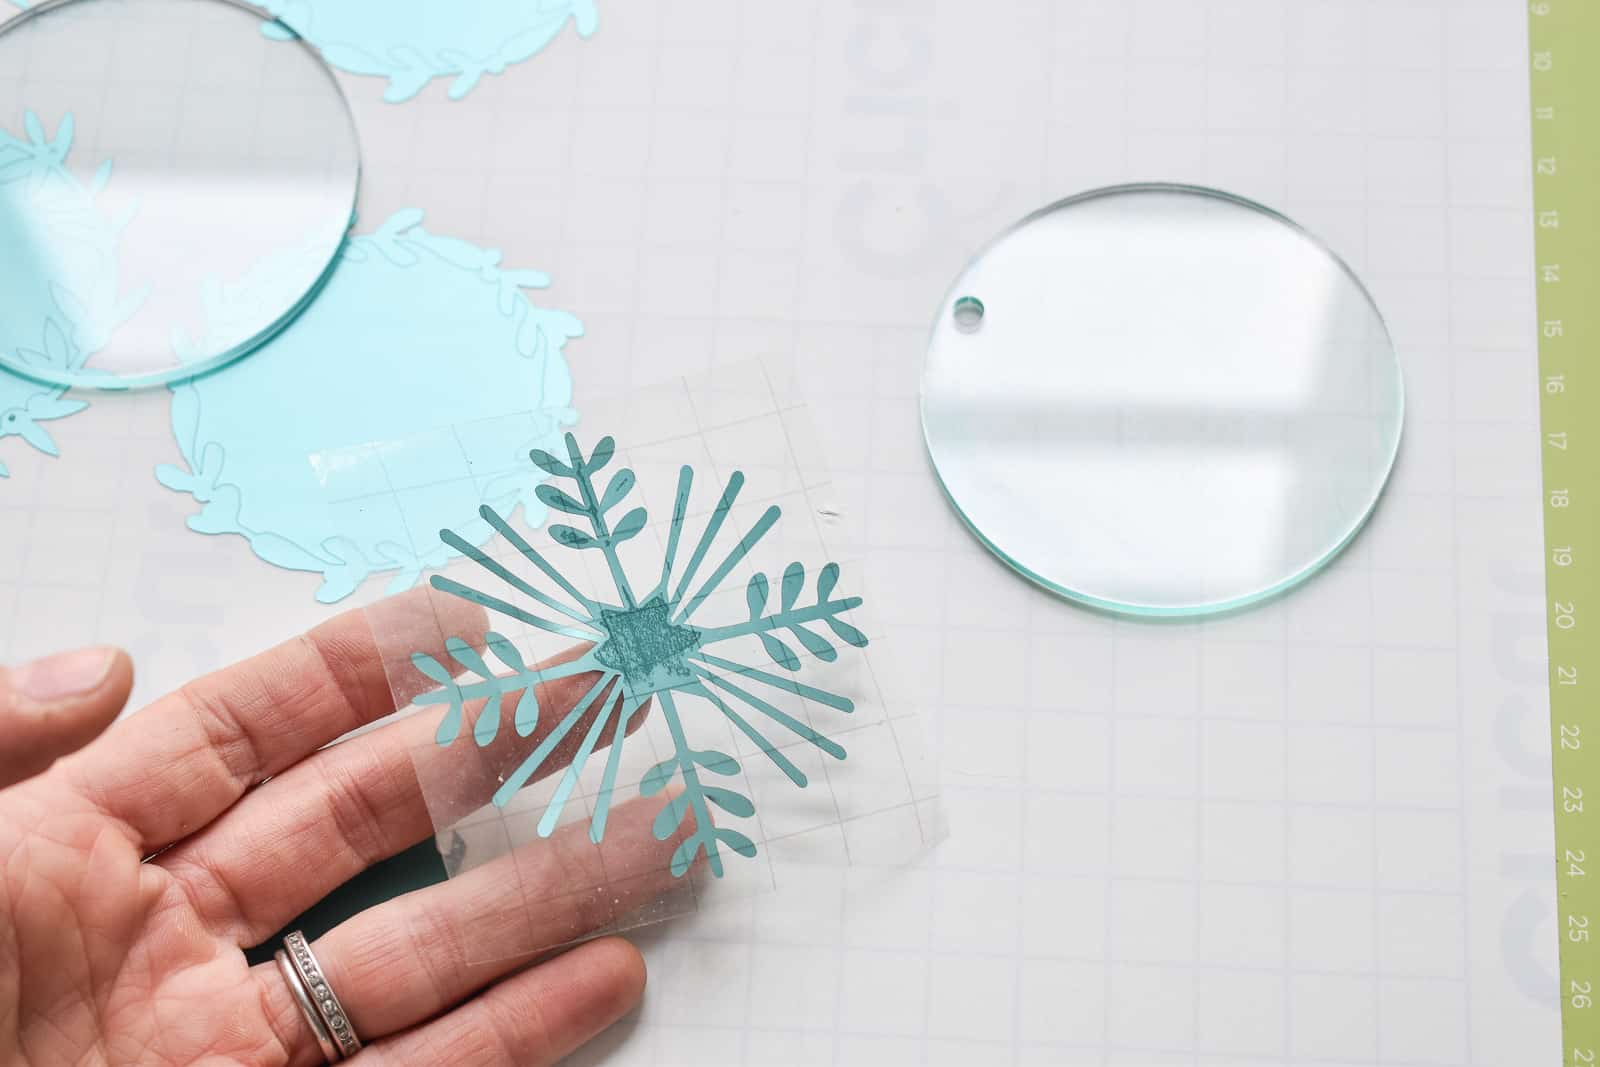 cricut snowflake on transfer tape